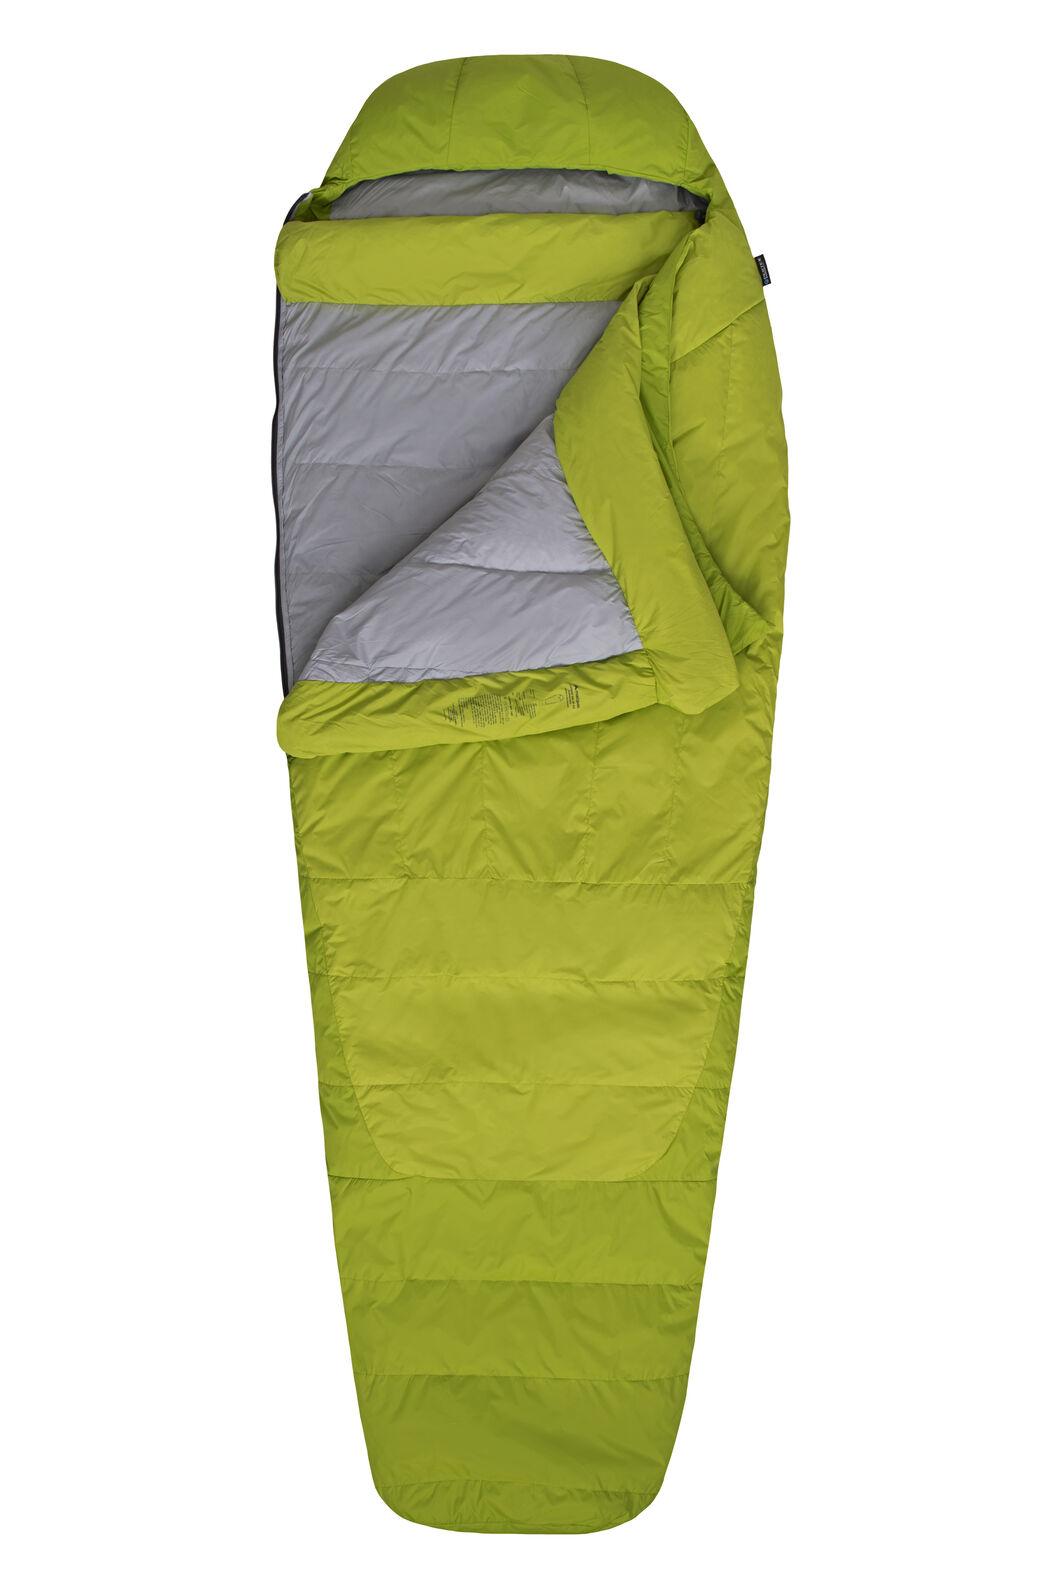 Macpac Latitude XP Goose Down 500 Sleeping Bag - Extra Large, Tender Shoots, hi-res